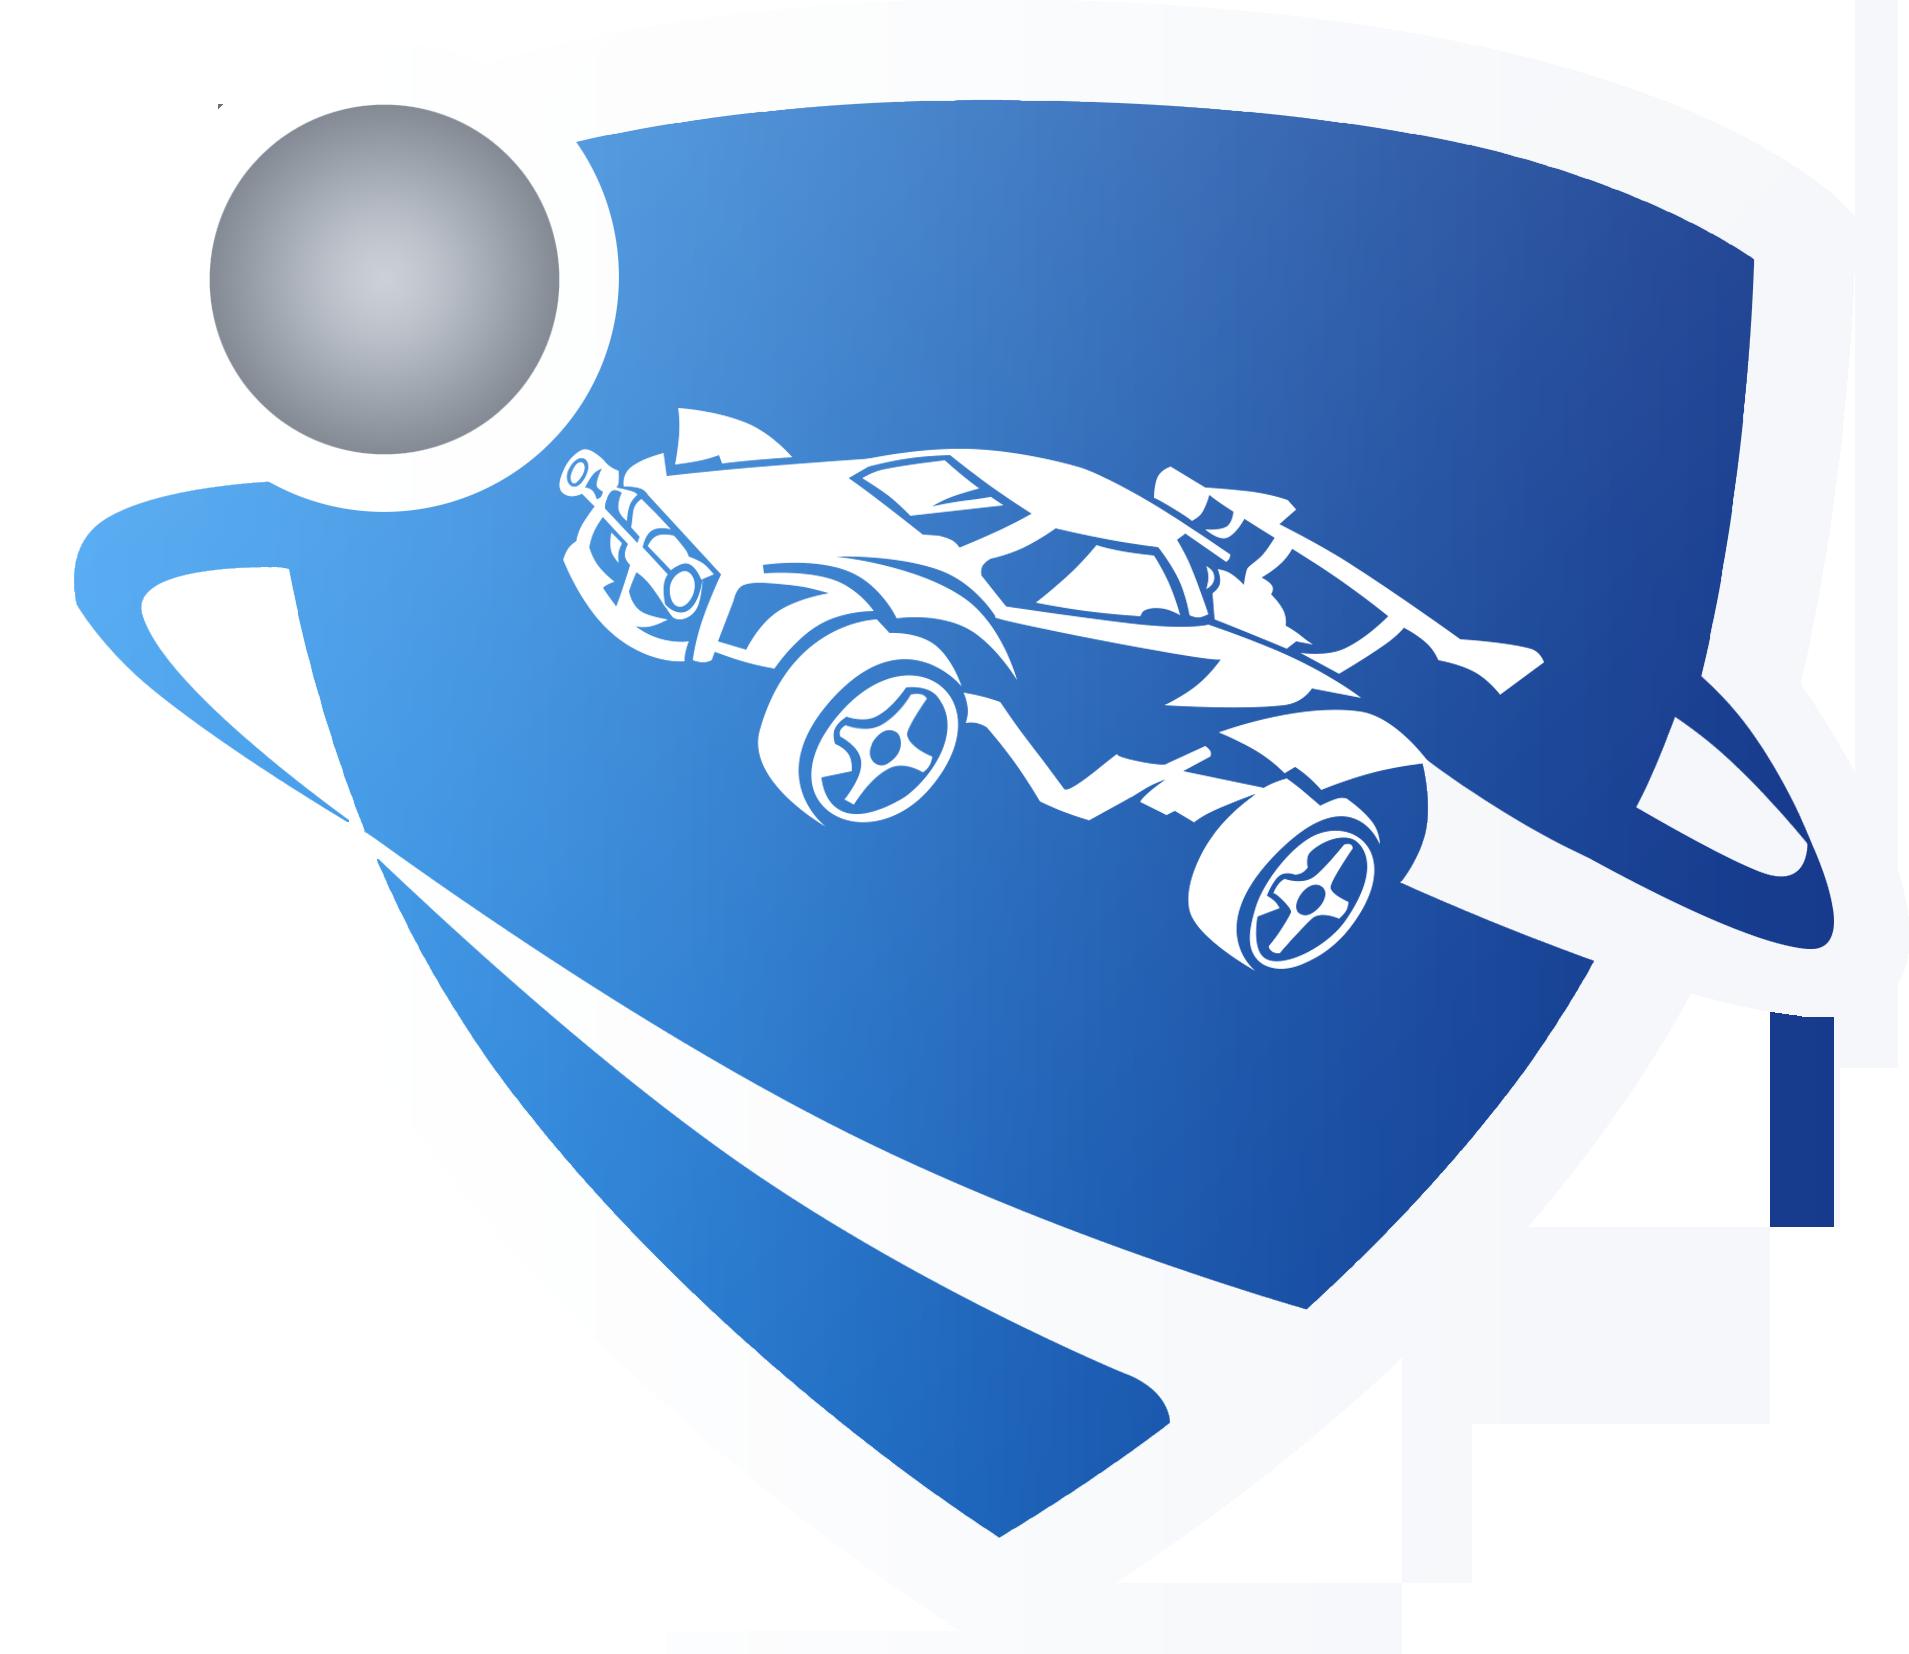 Account Rocket League 2019